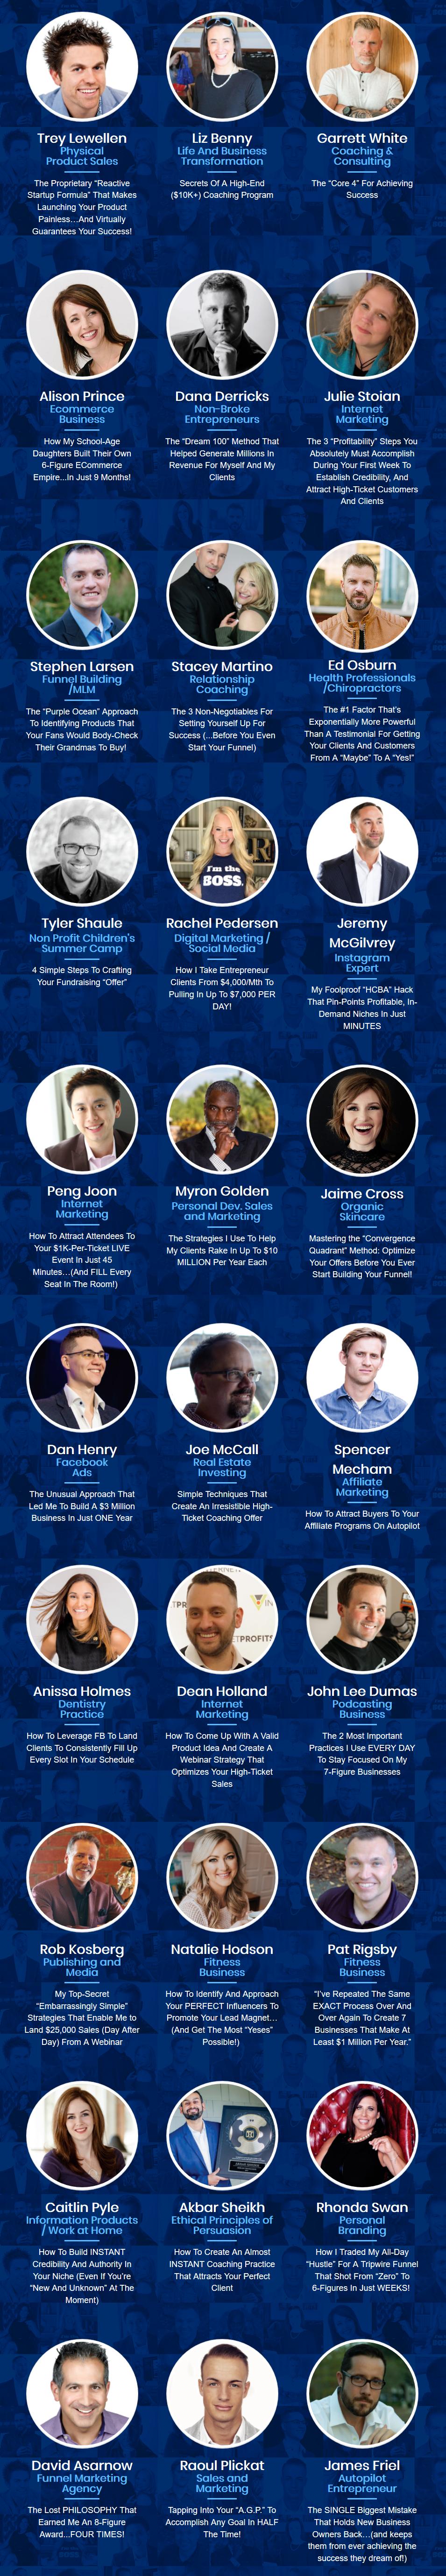 30 days summit speakers - two comma club winners team